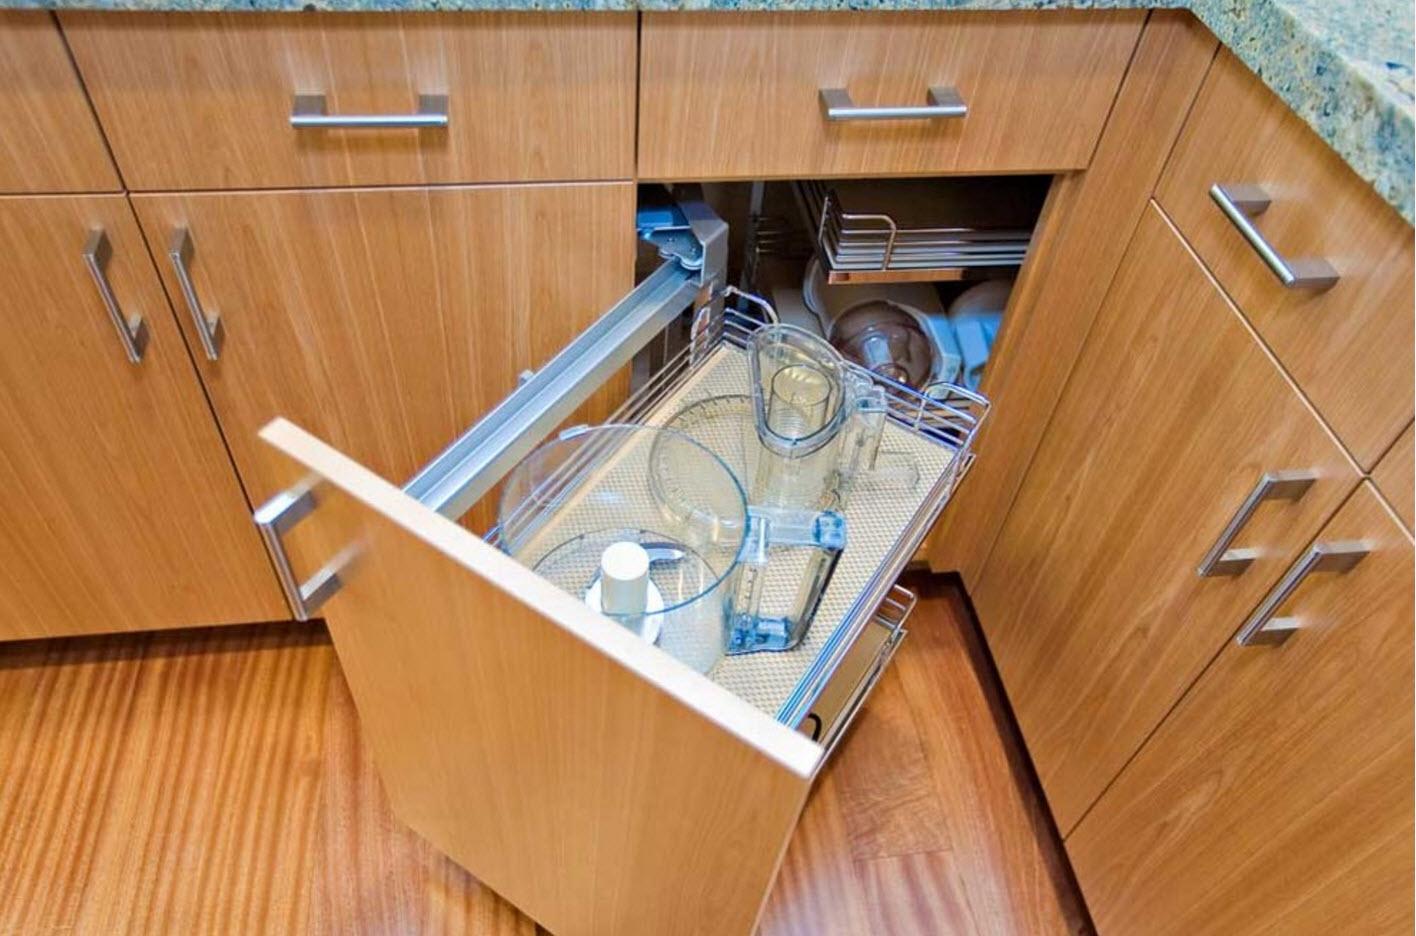 wooden furniture set and wisely designed storage on aluminum frame